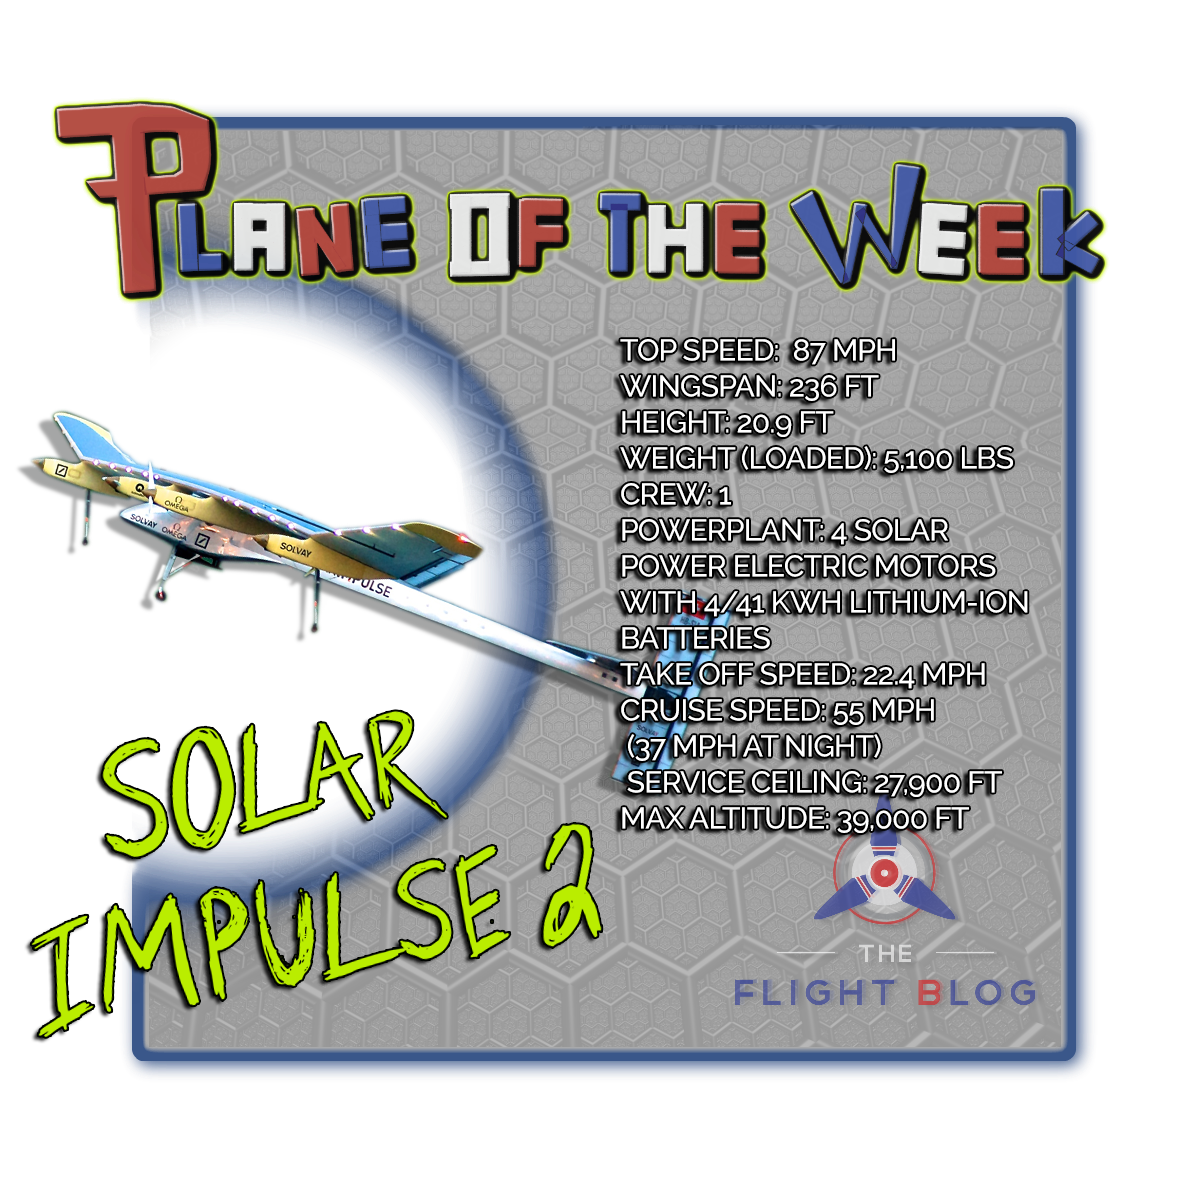 SOLAR IMPULSE 2 SPECS